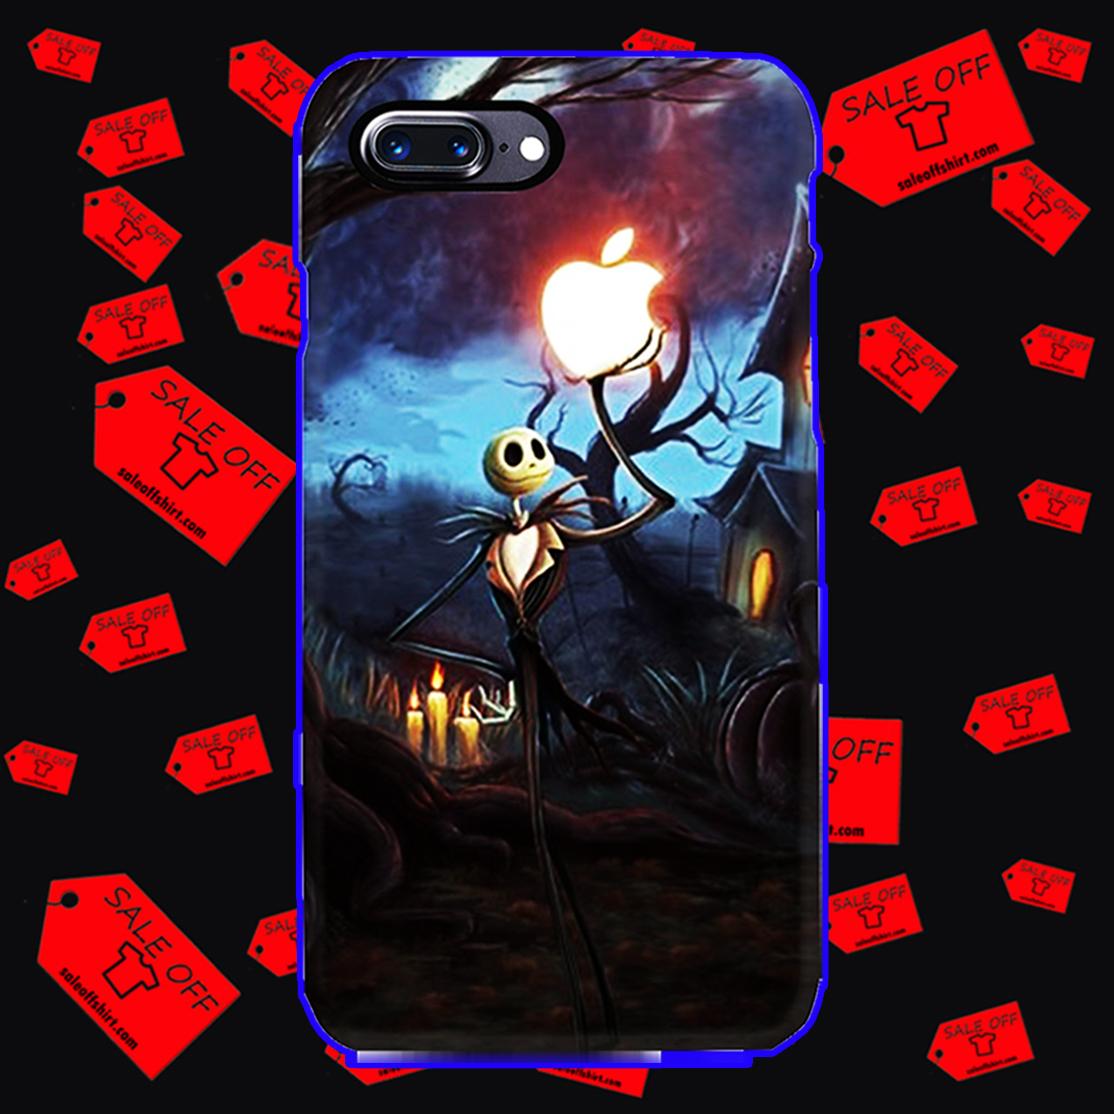 Jack Skellington Apple phone case - iphone 7 plus case